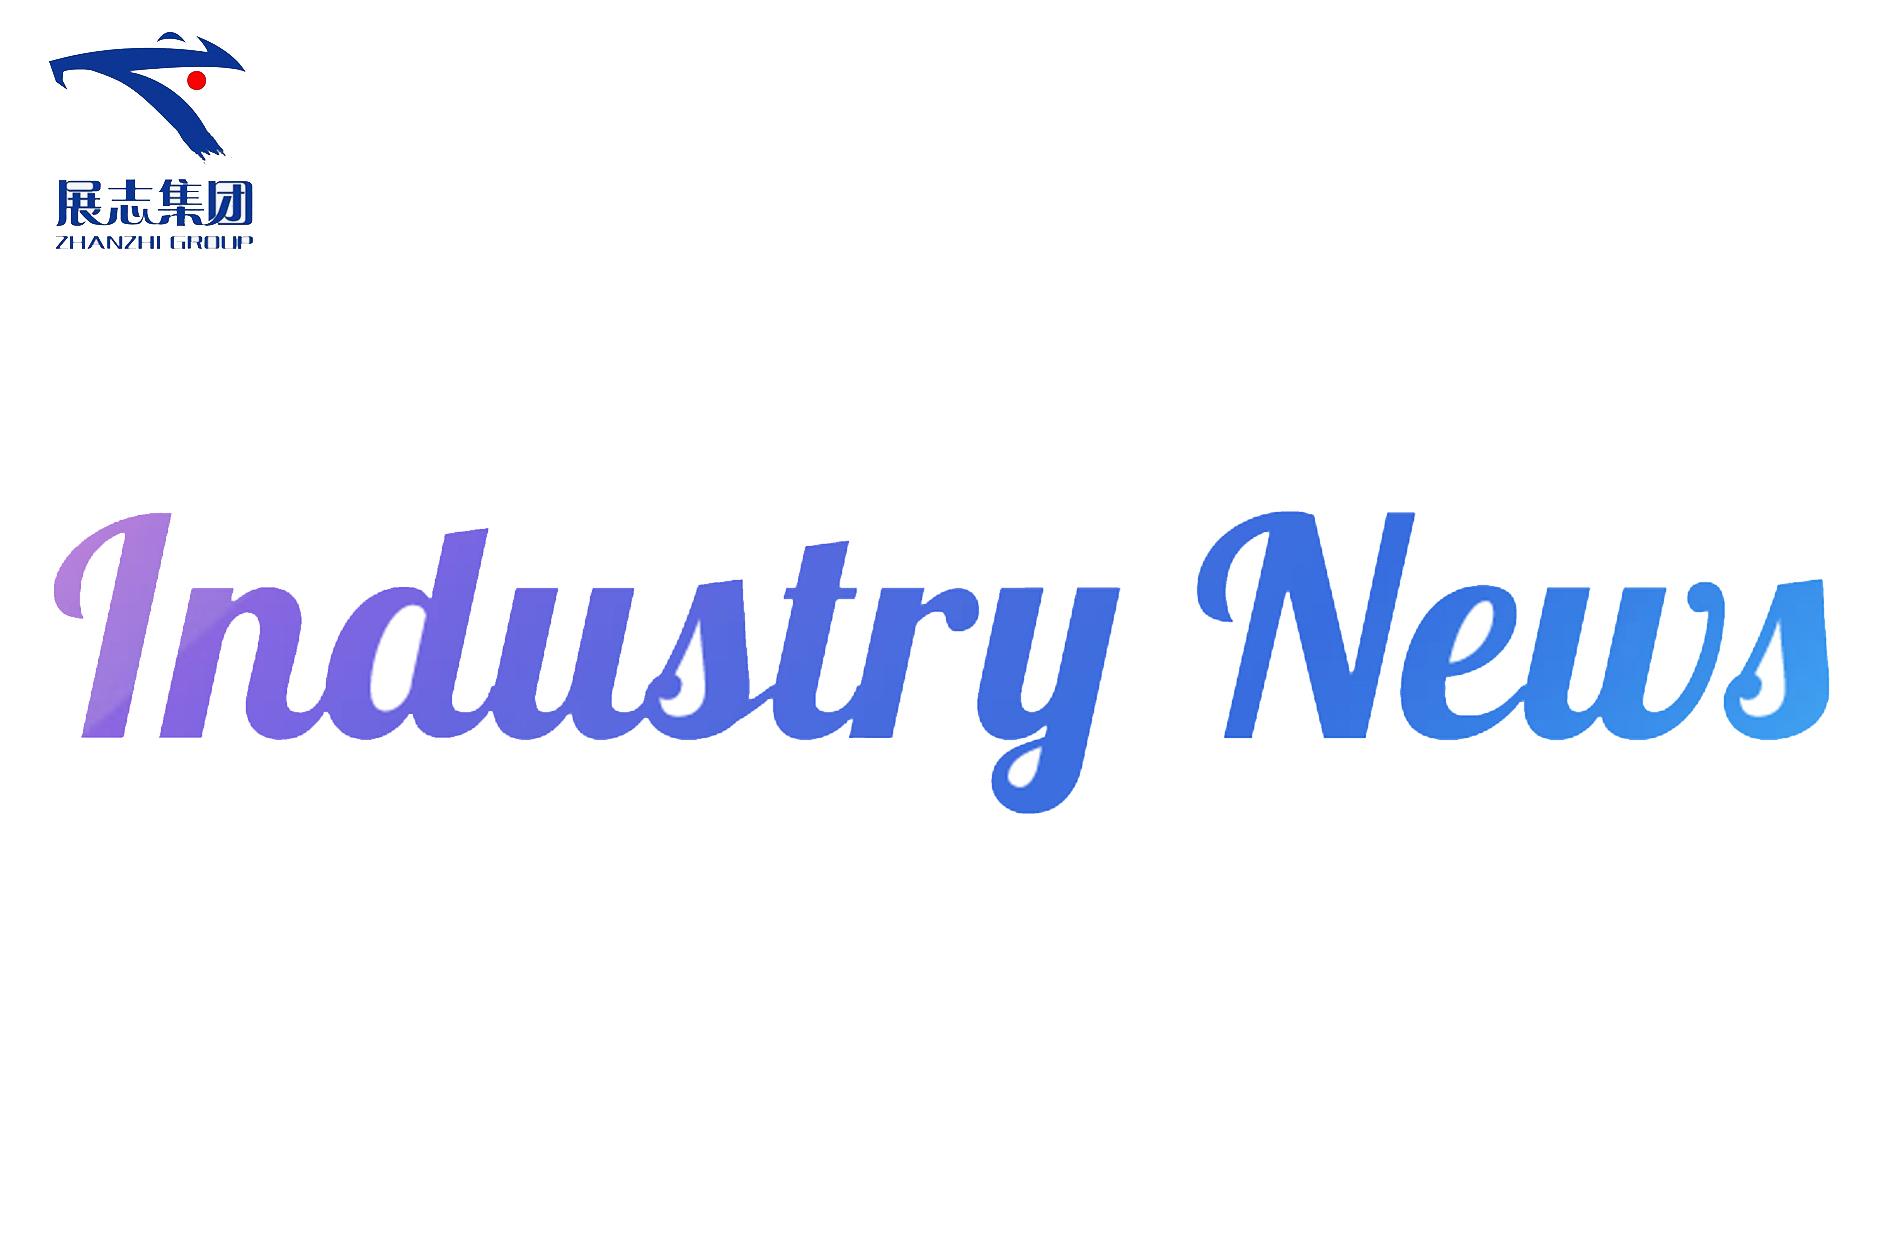 Industry News 2.1